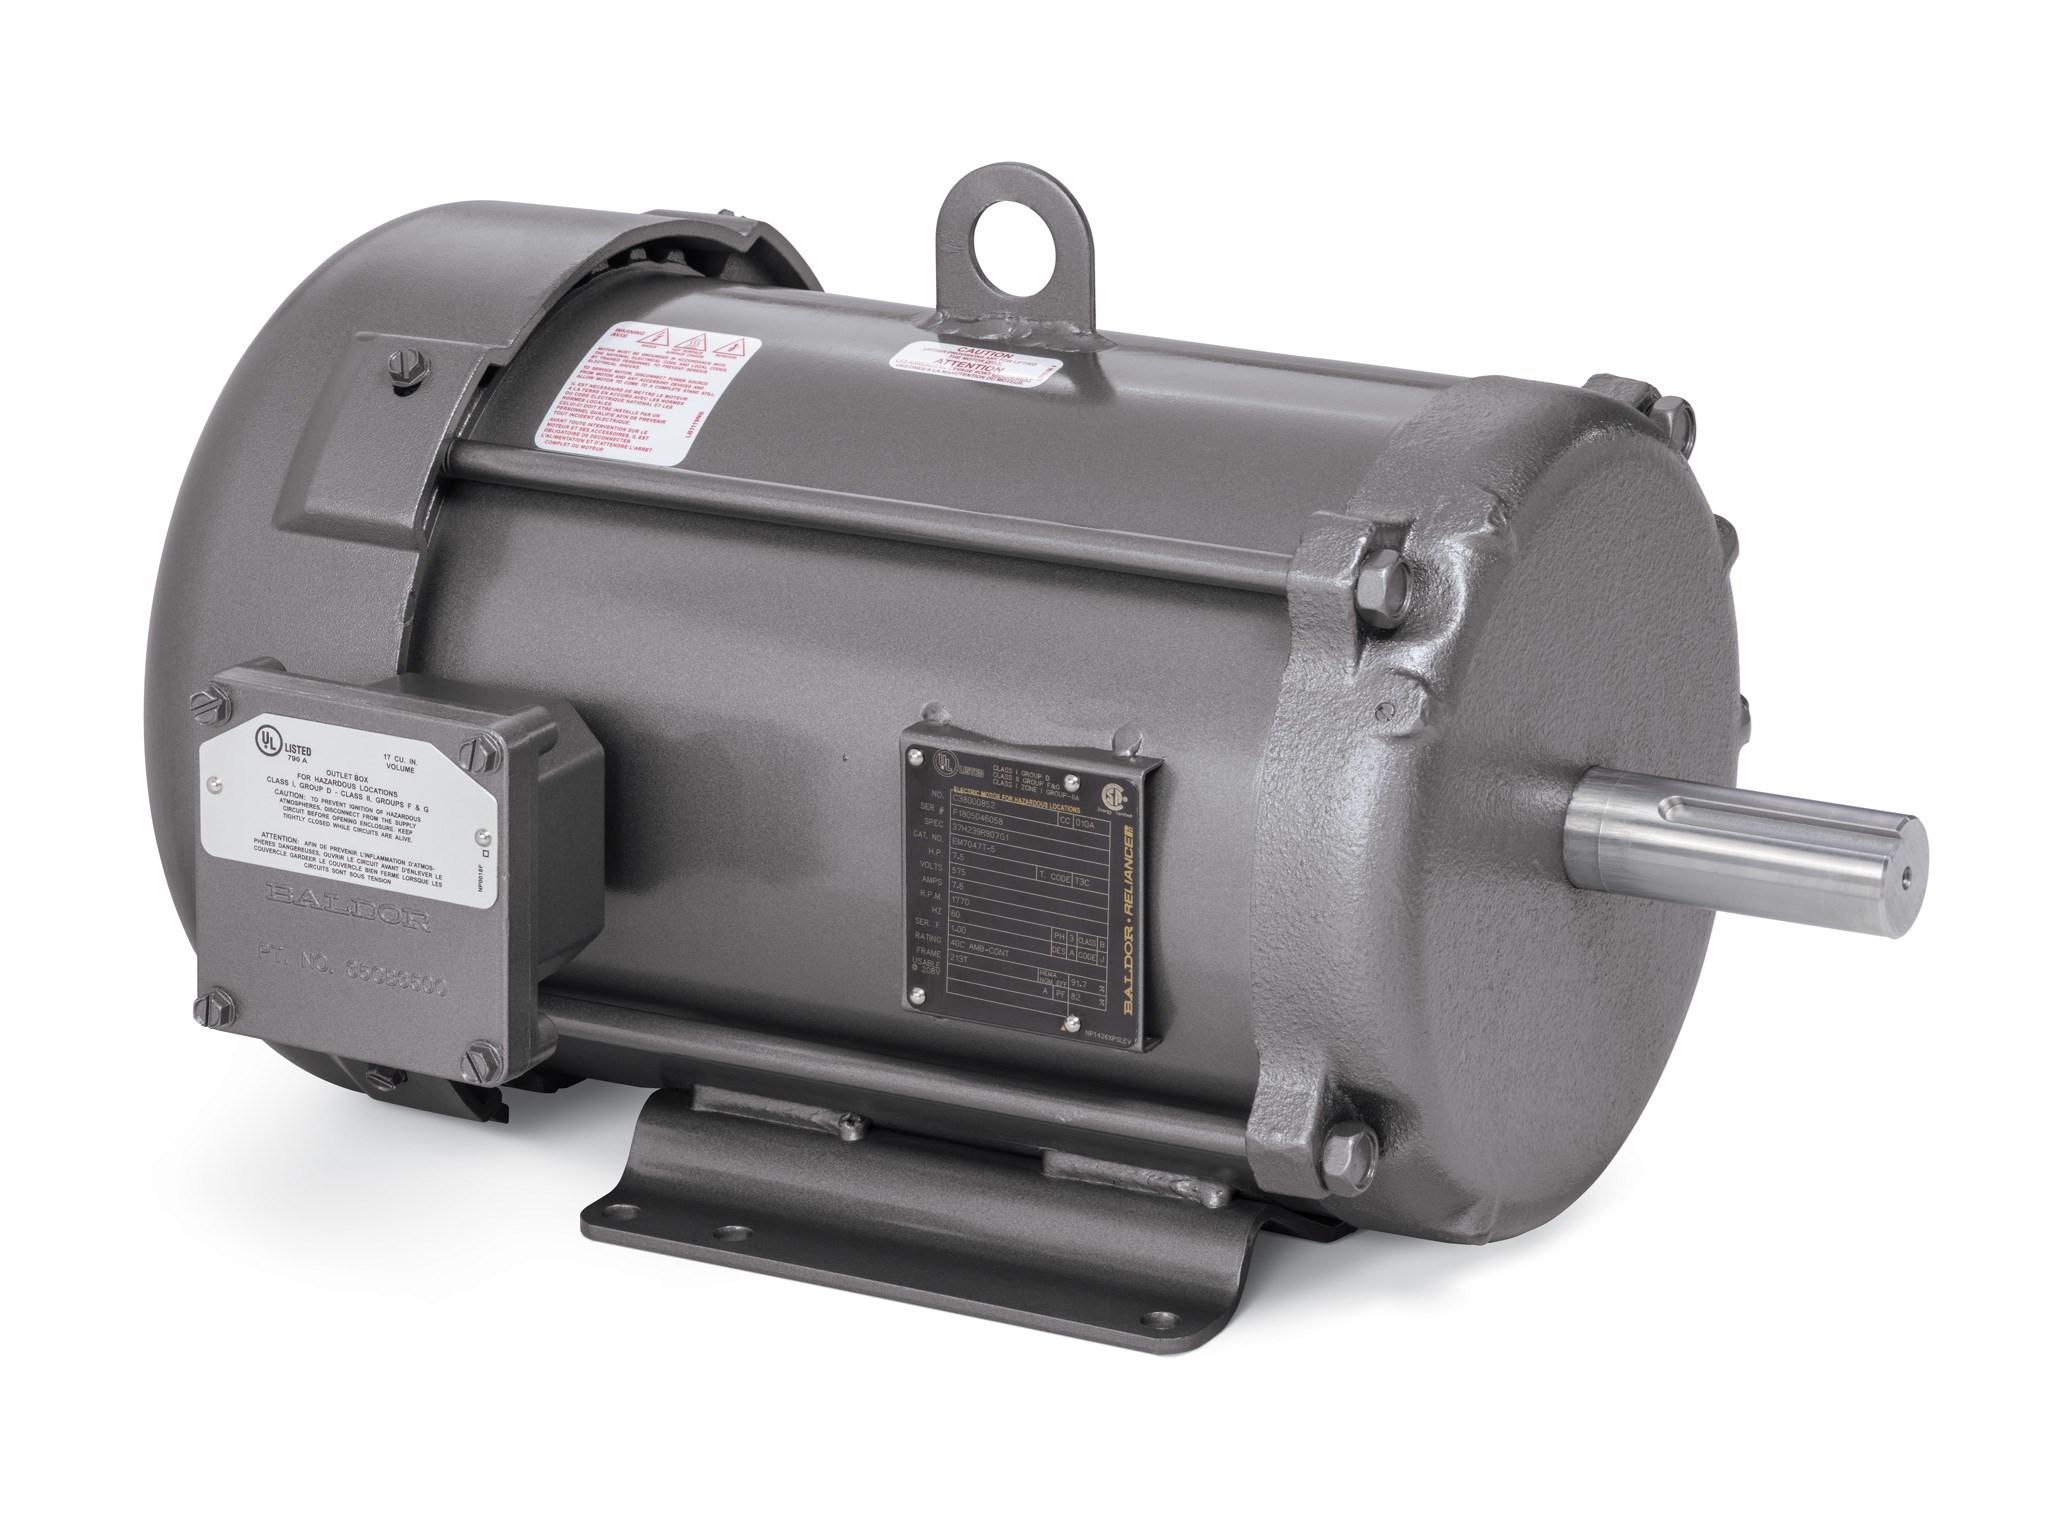 Explosion Proof Motor Wiring Diagram Electrical Diagrams Dryer 115v X603 Baldor Com Seal